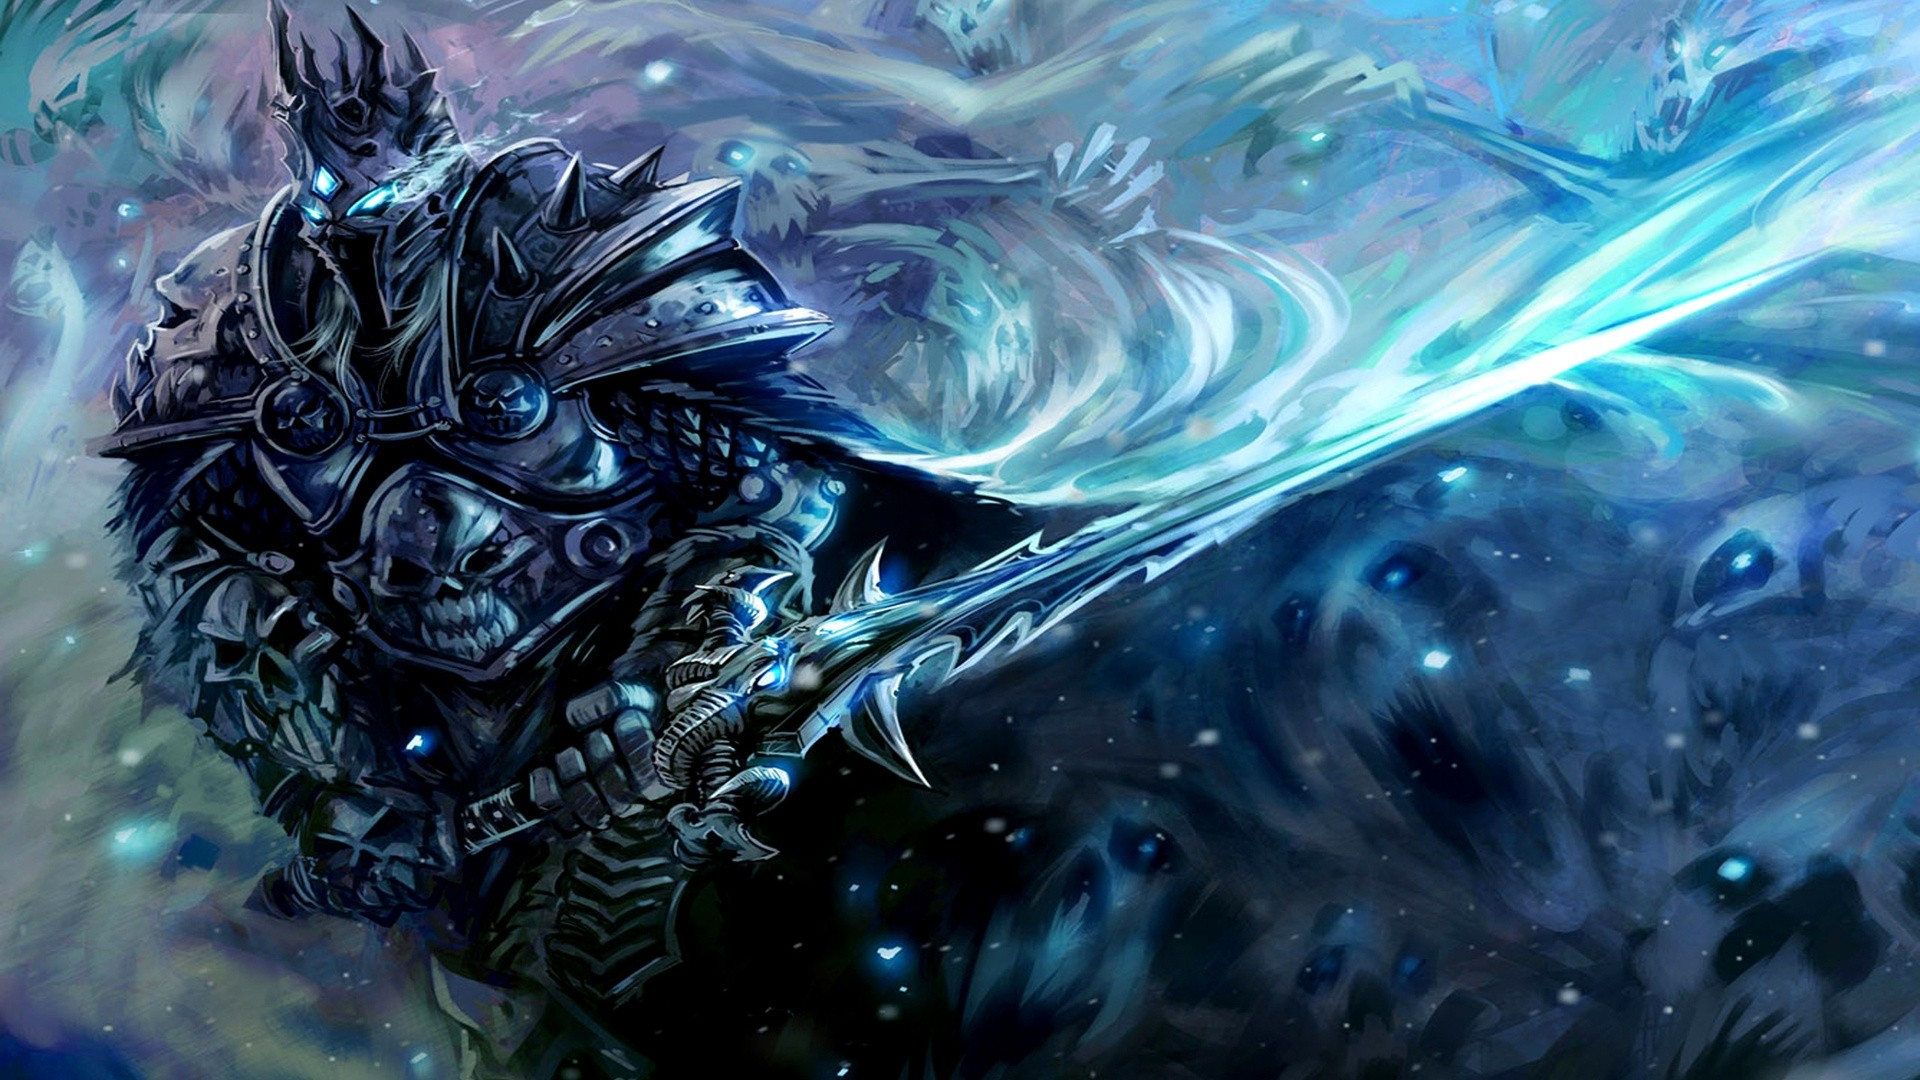 World Of Warcraft computer wallpaper